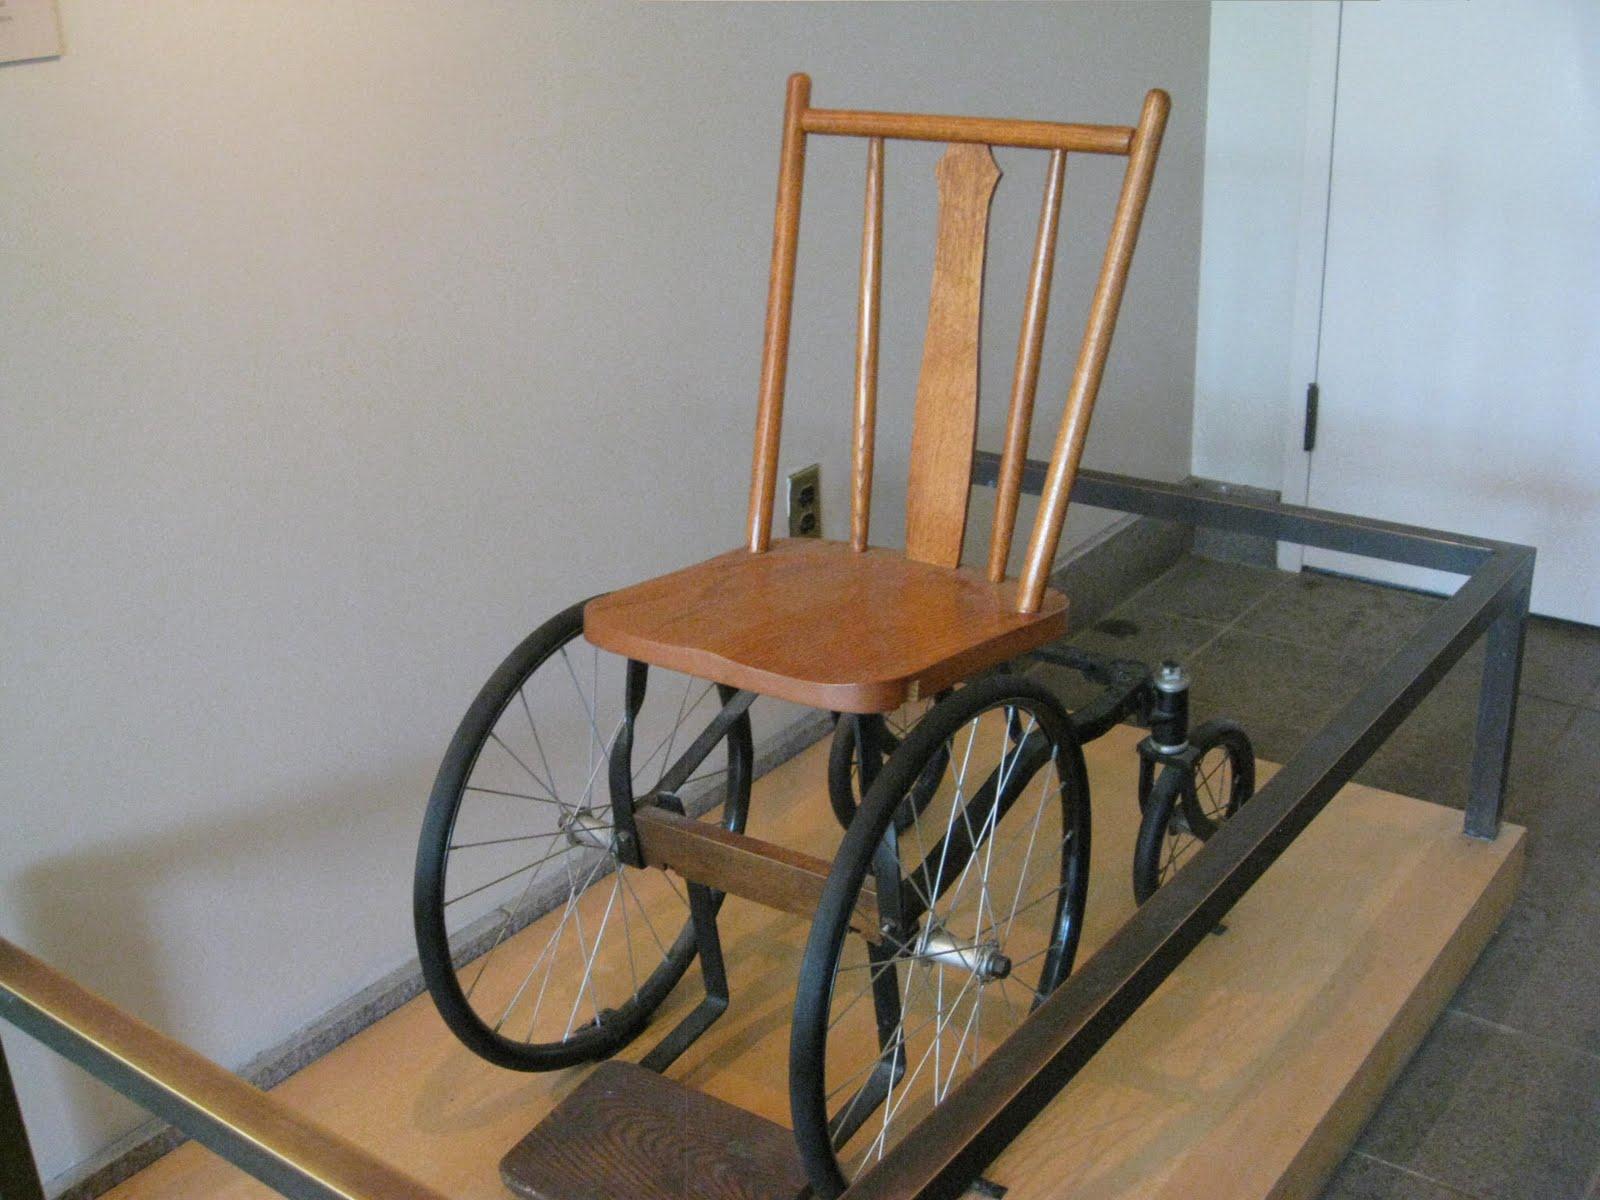 noah fischer  |Fdr Wheelchair Blanket